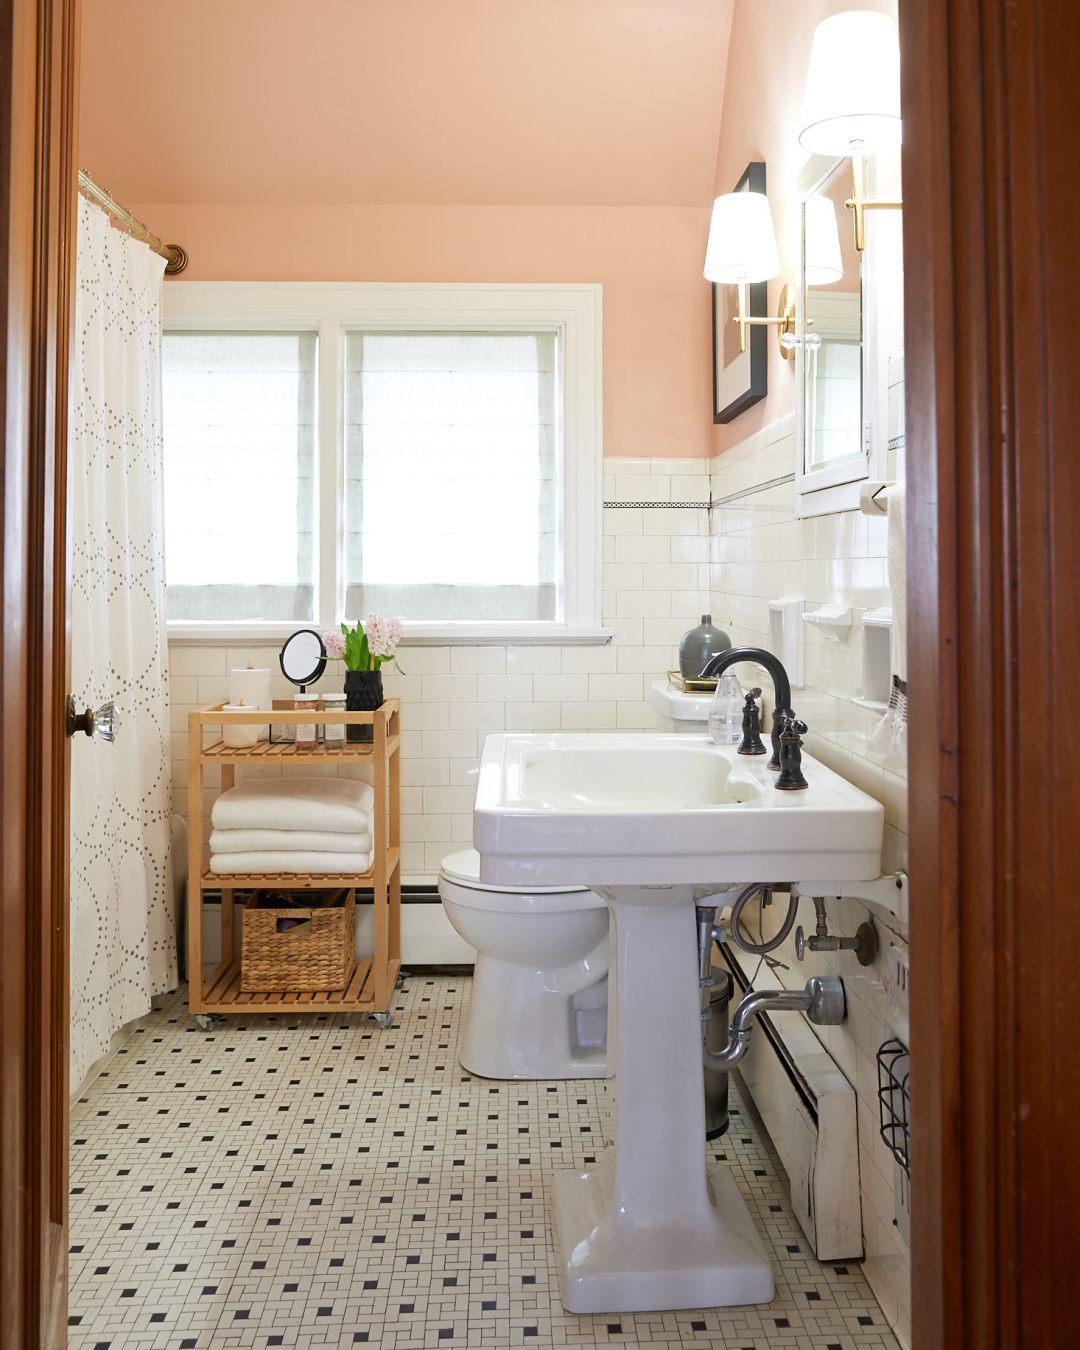 Blush bathroom with shades drawn lit by sconces